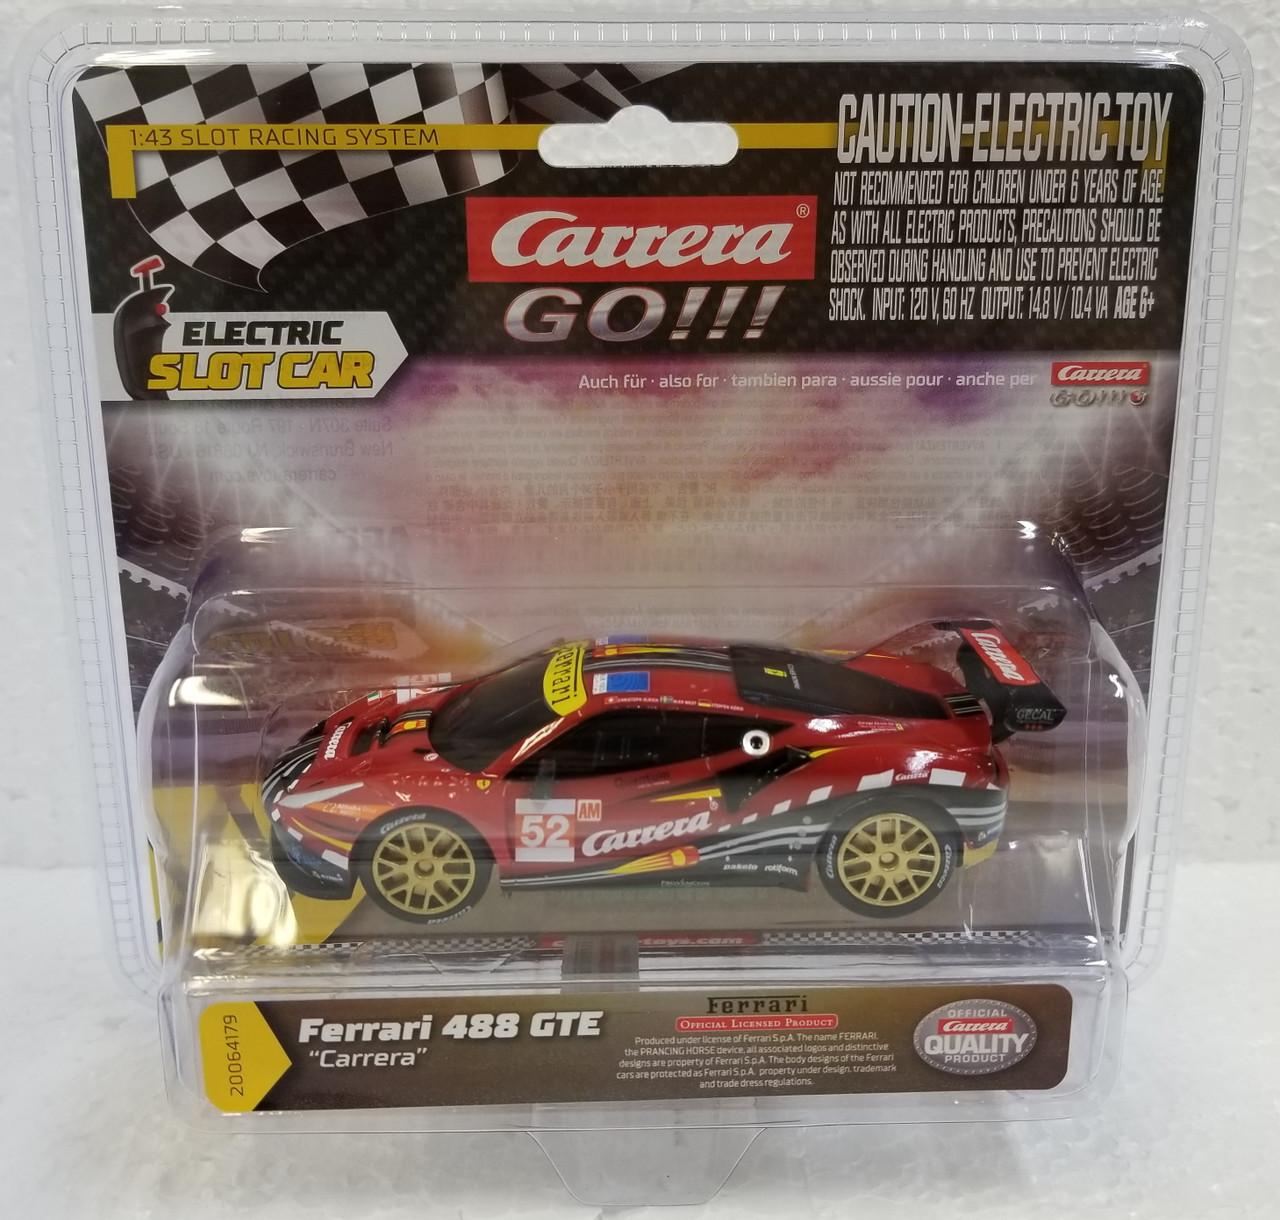 Slot Car Race Tracks Carrera 64179 Ferrari 488 GT3 Carrera 1:43 Scale Analog Slot Car Racing Vehicle for Carrera GO!! 20064179